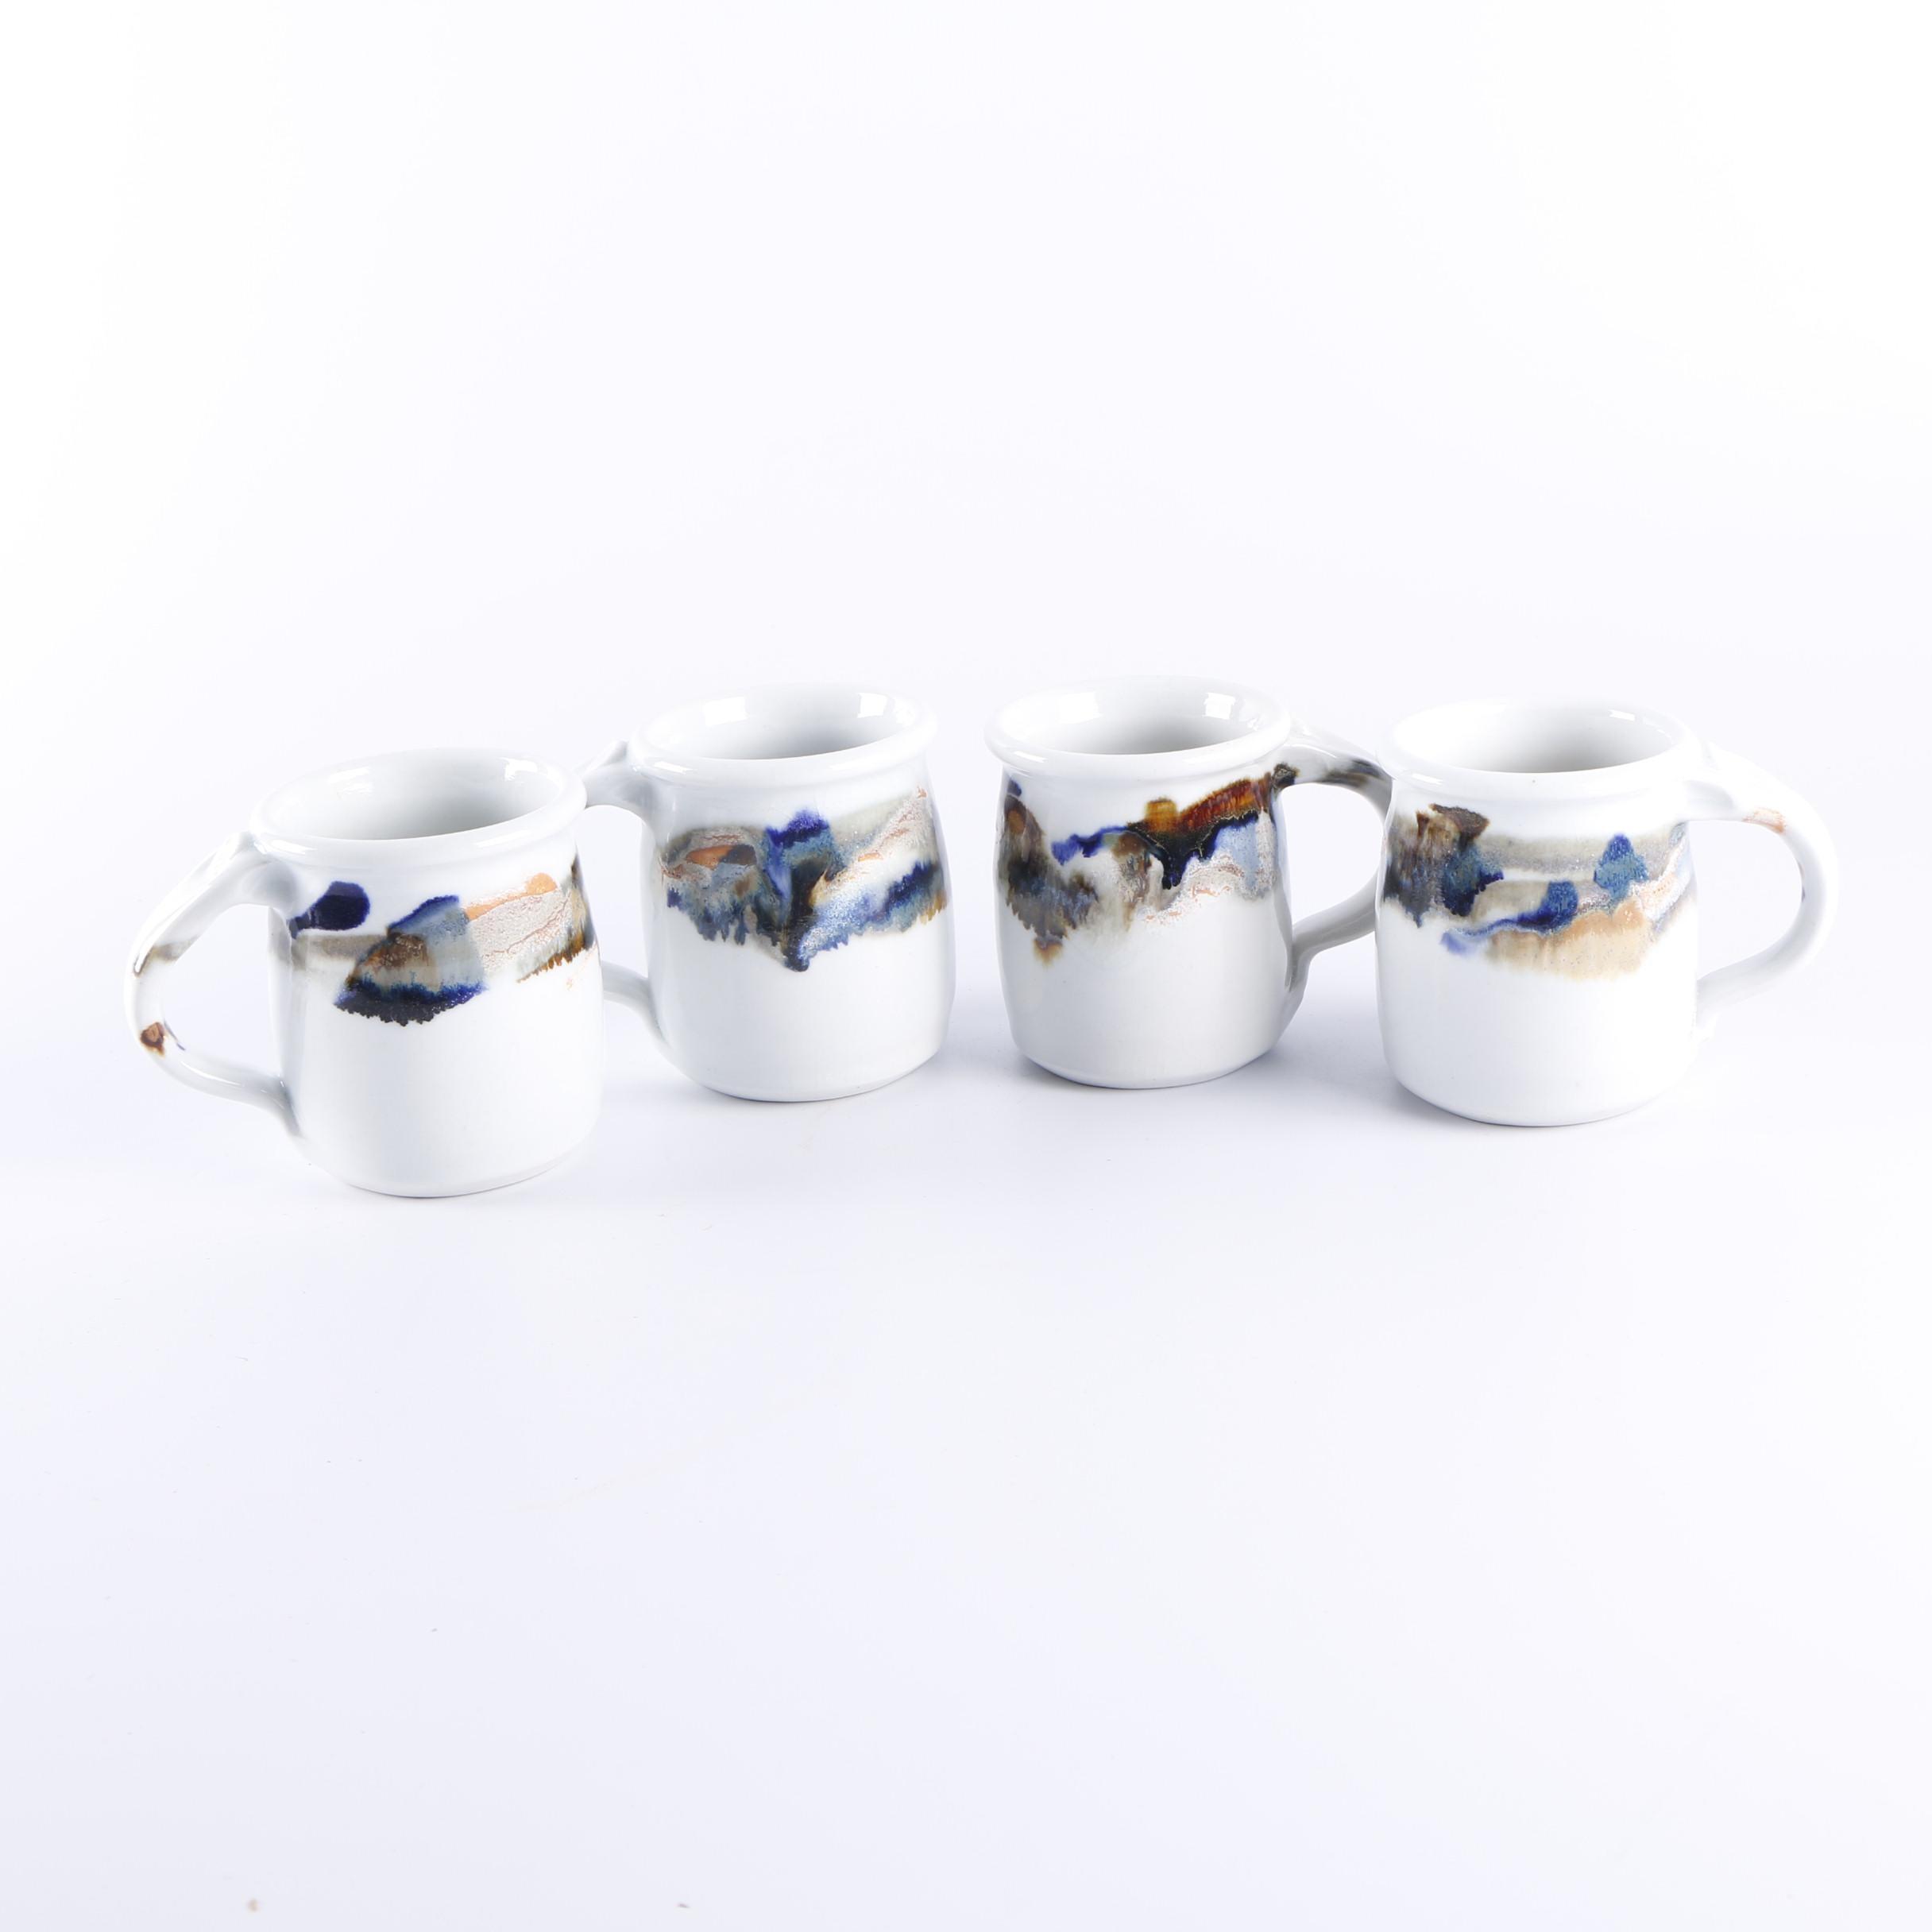 Studio Signed Don Brimberry Drip Glazed Pottery Mugs